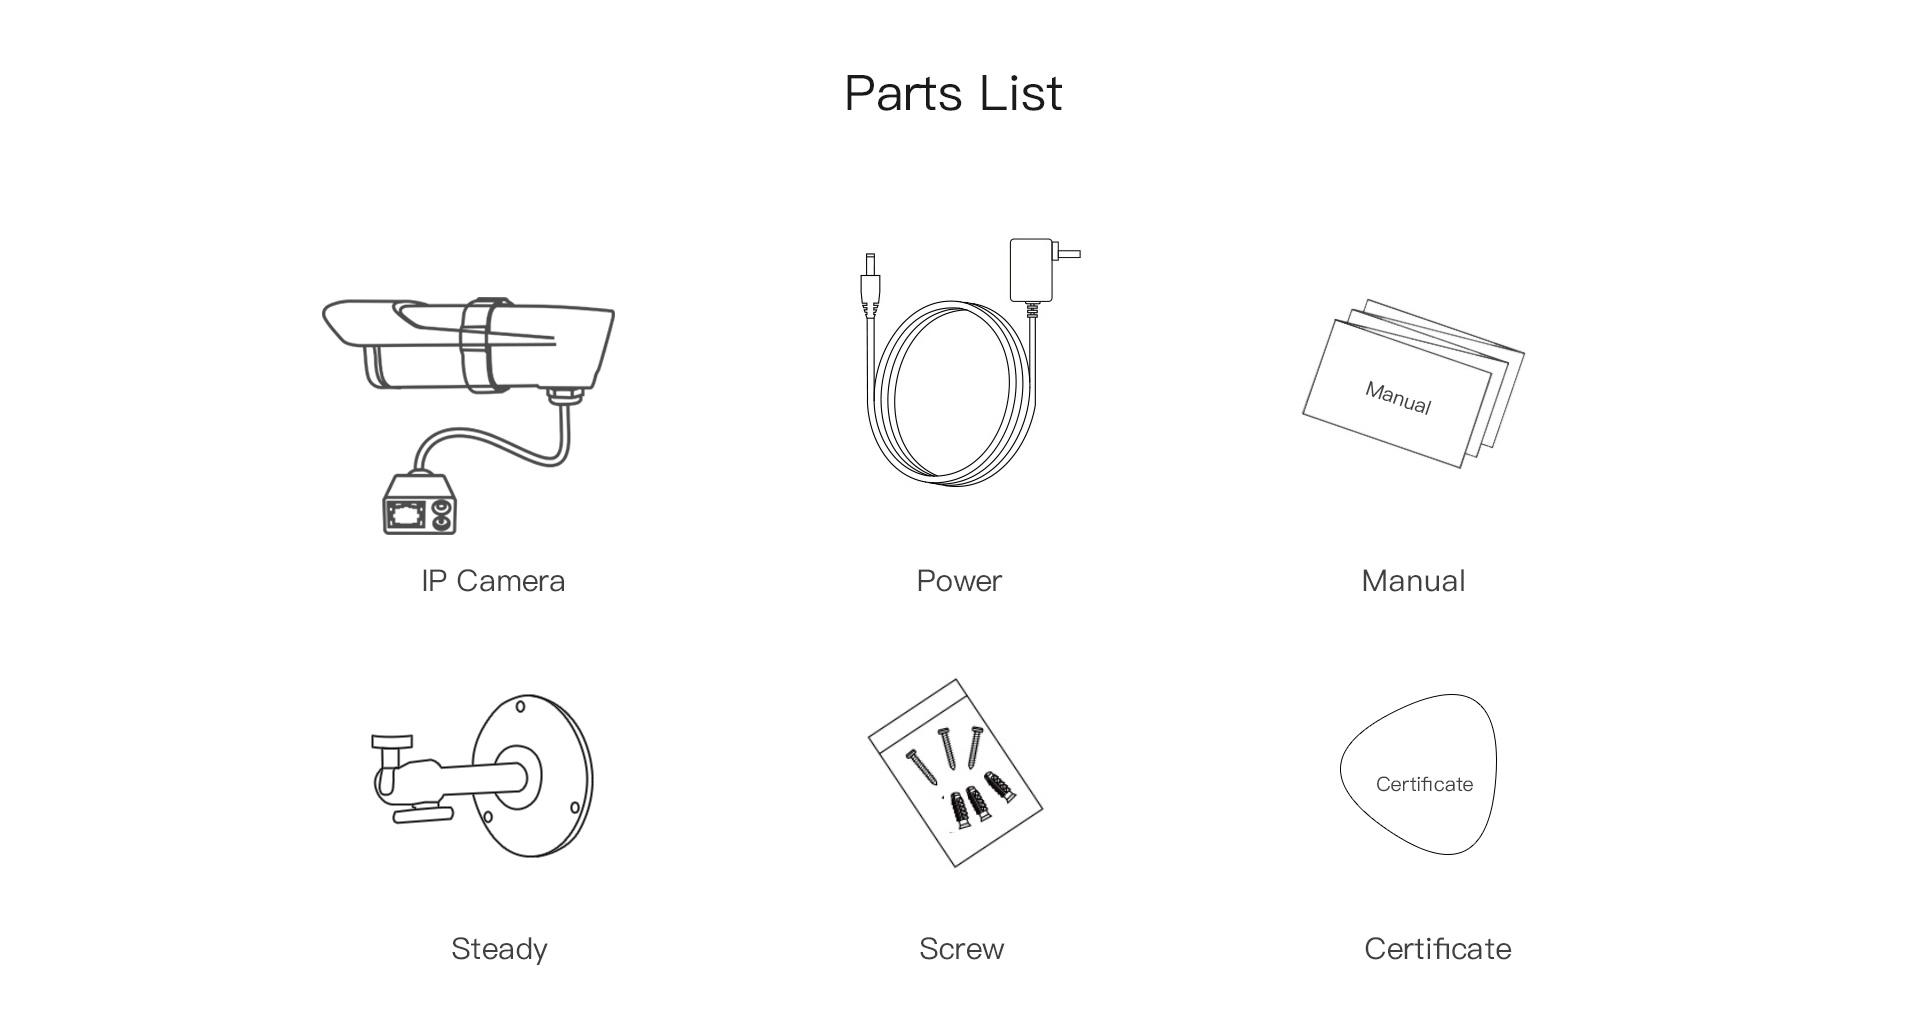 outdoor ip camera parts list